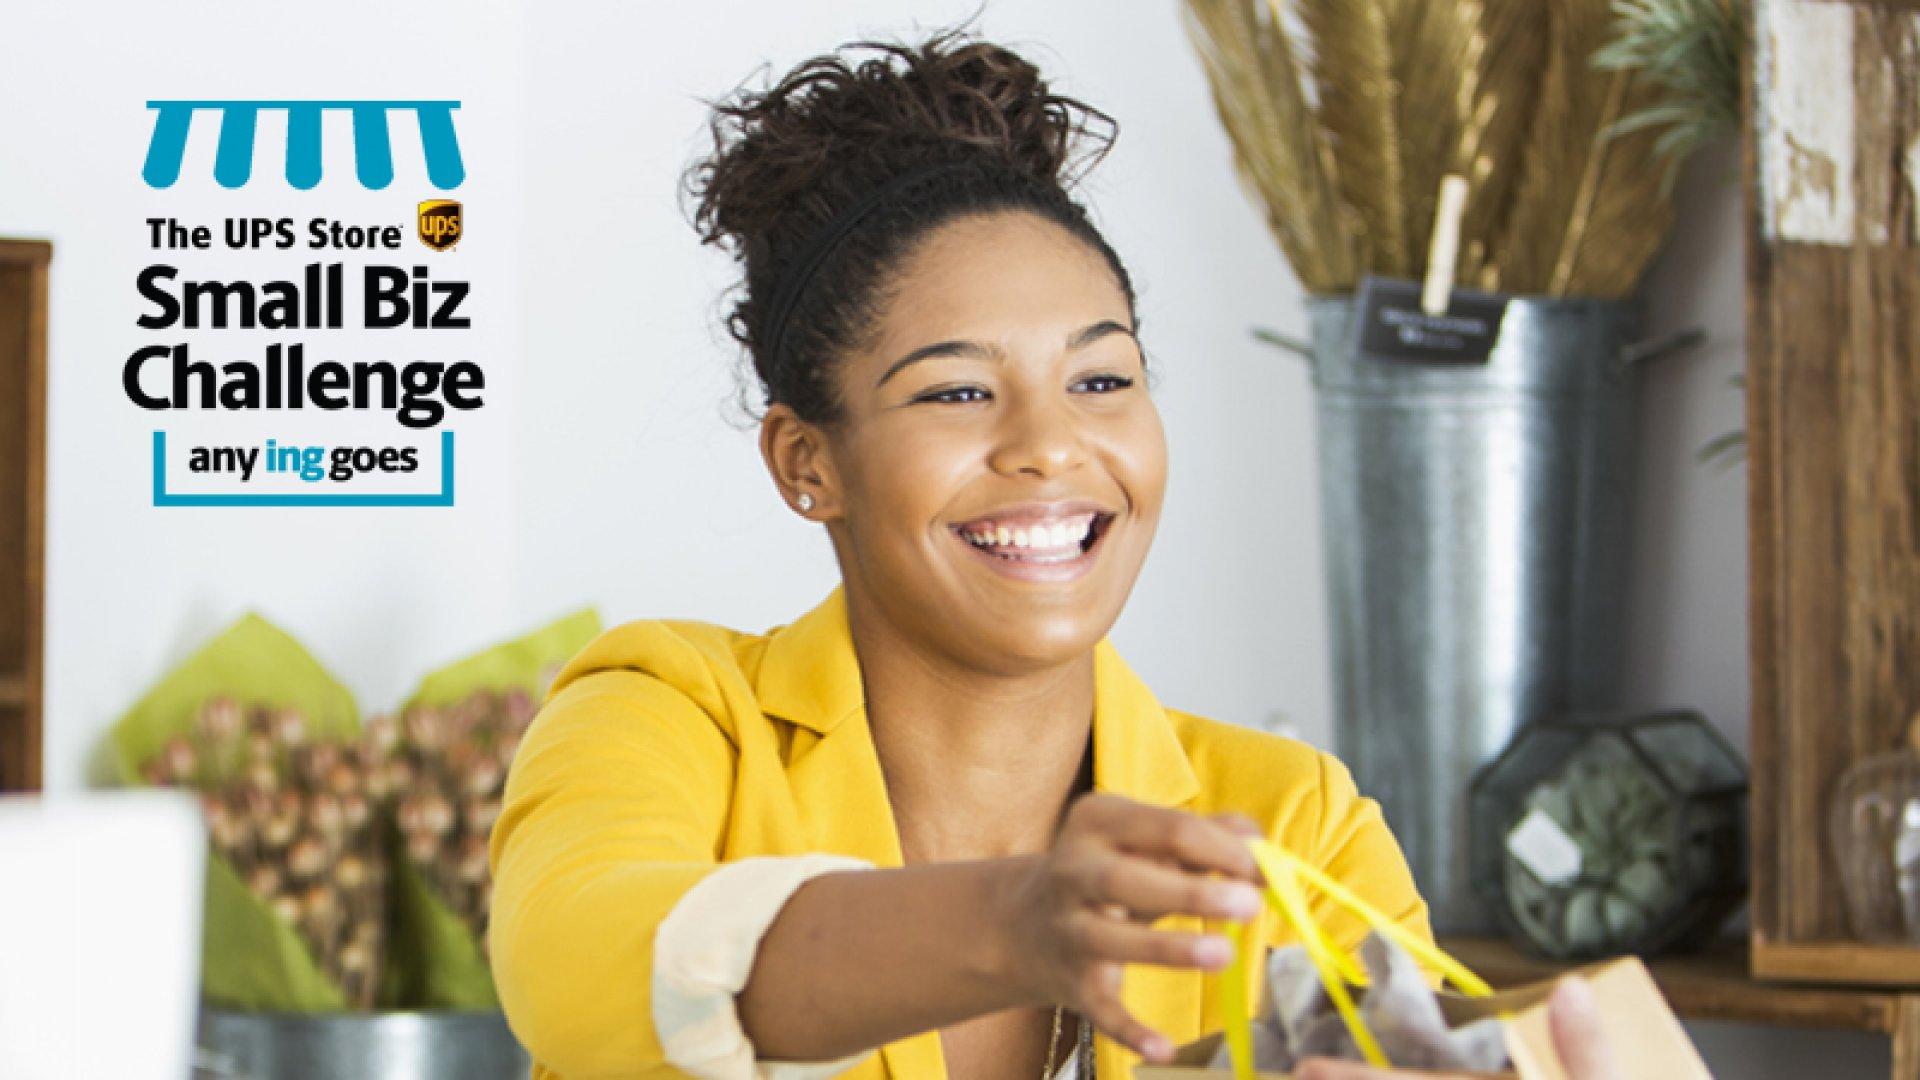 The UPS Store® Small Biz Challenge